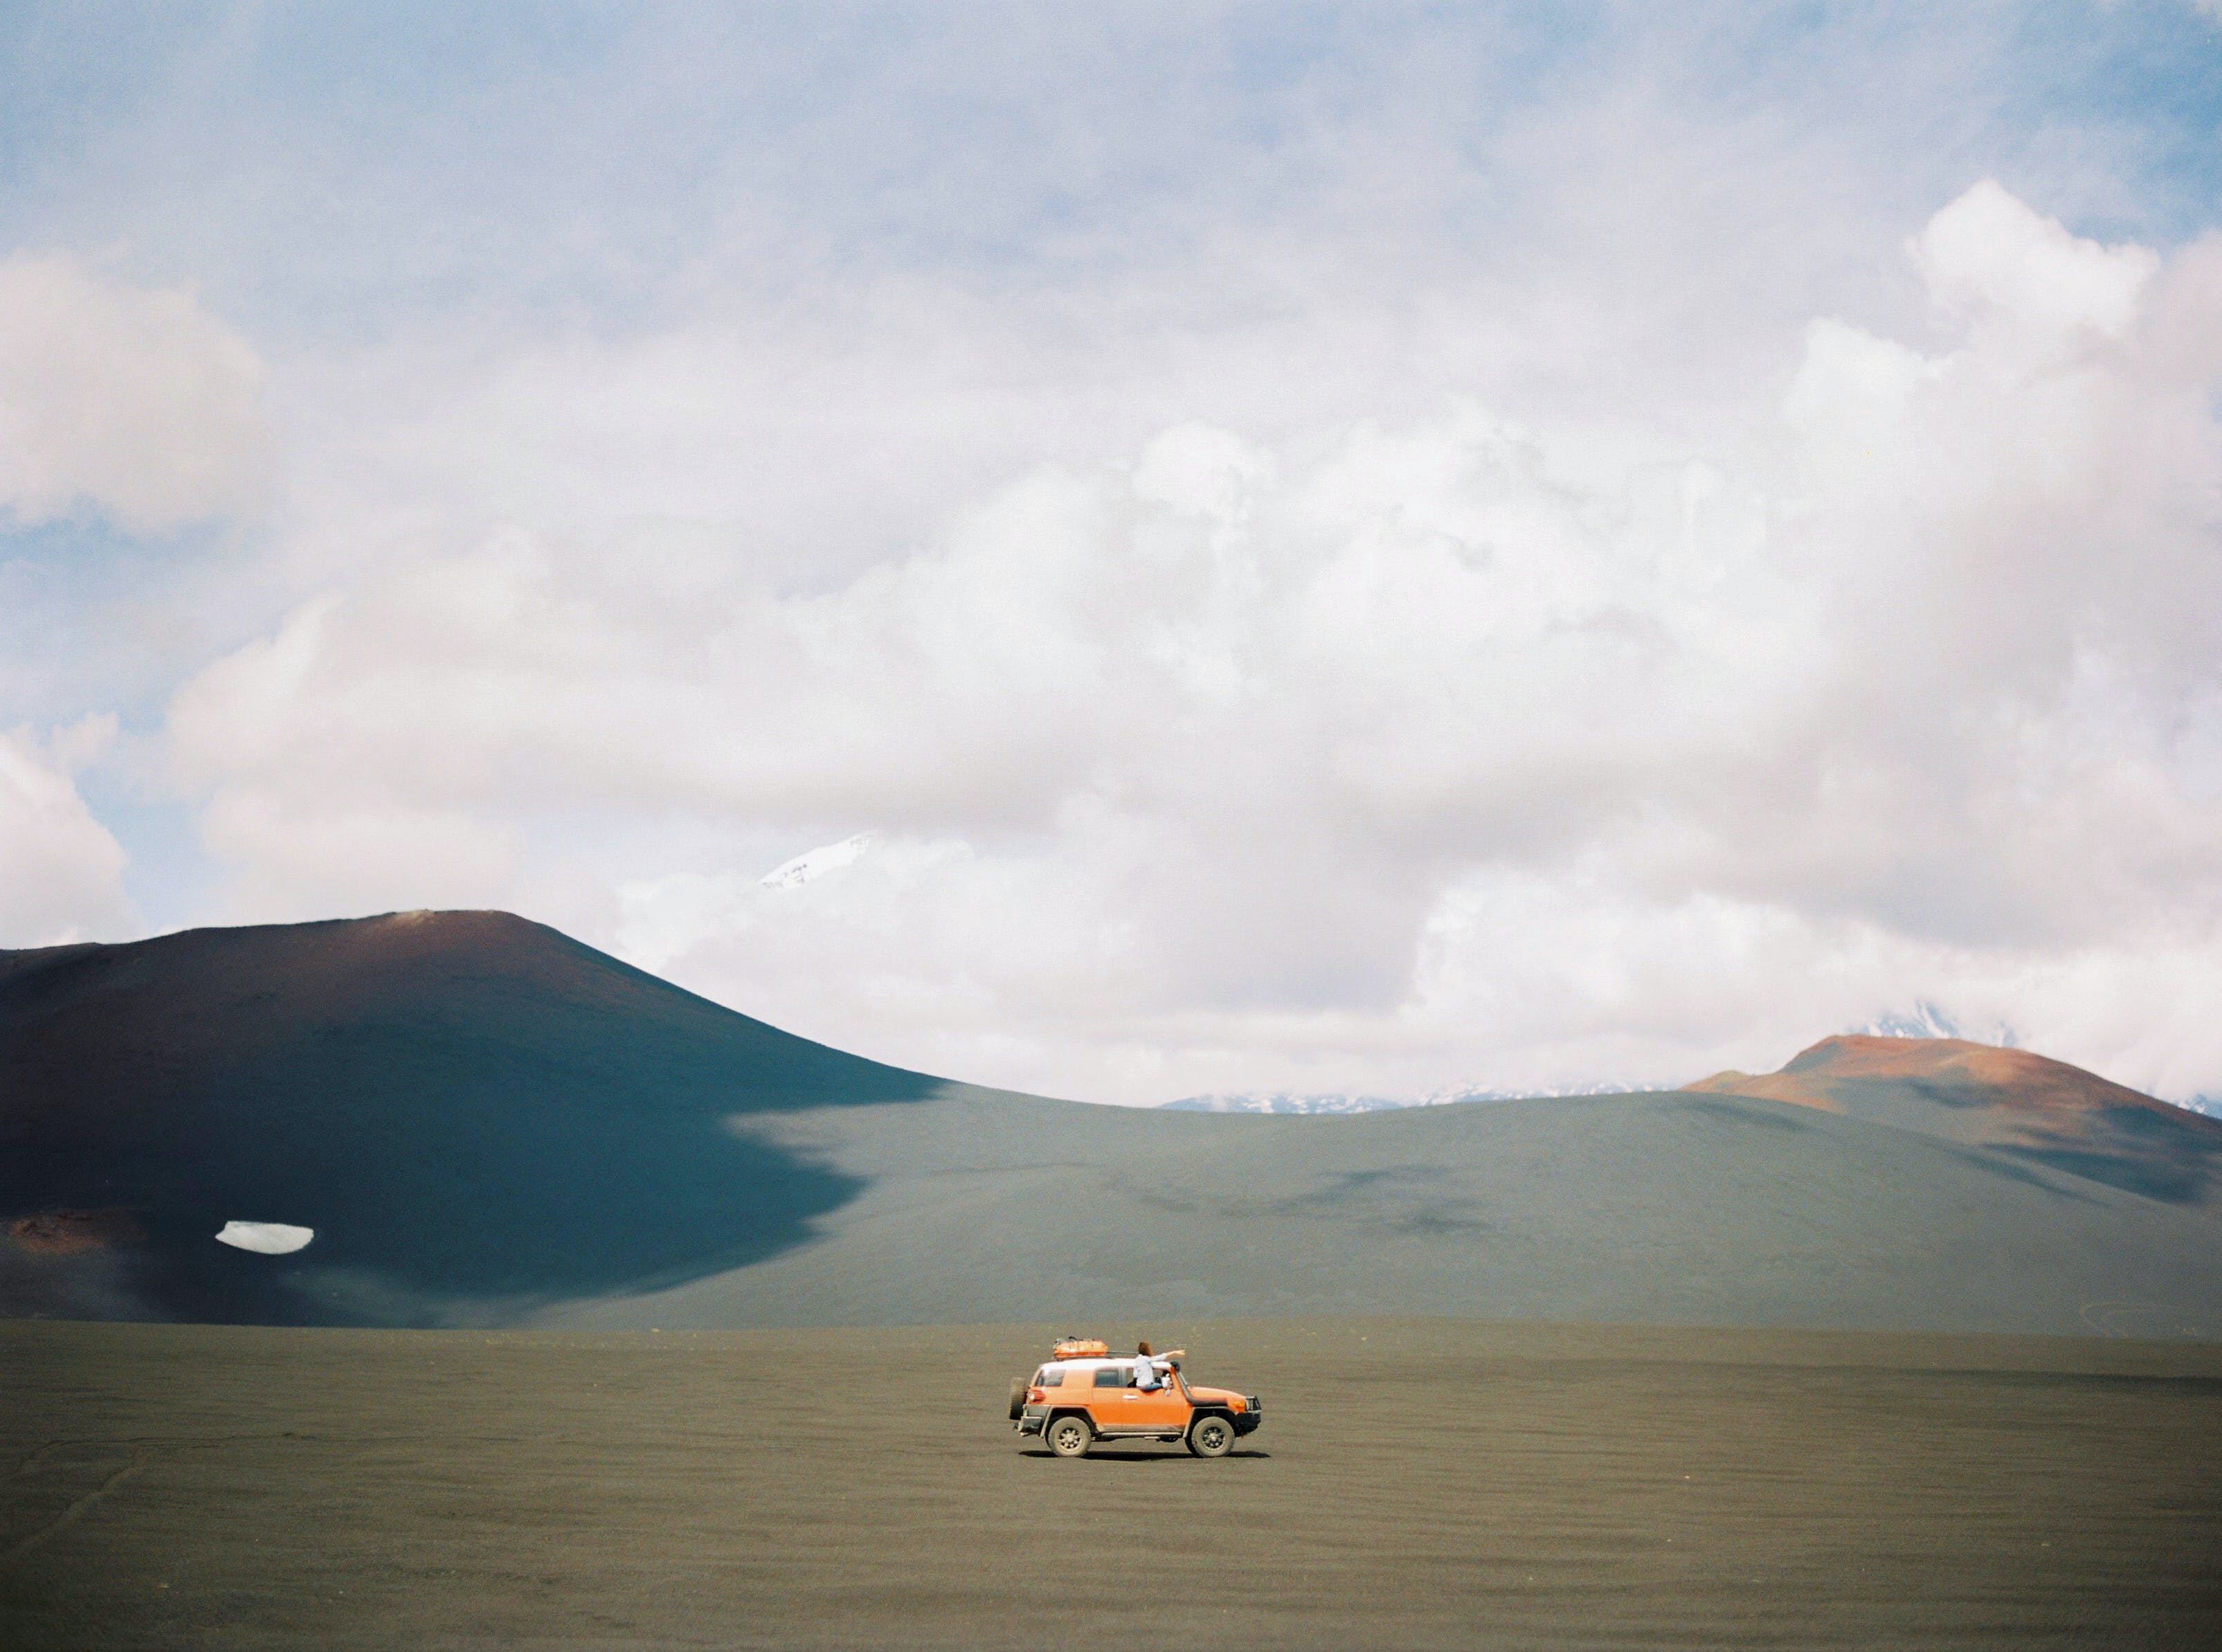 Orange Vehicle on Brown Sand